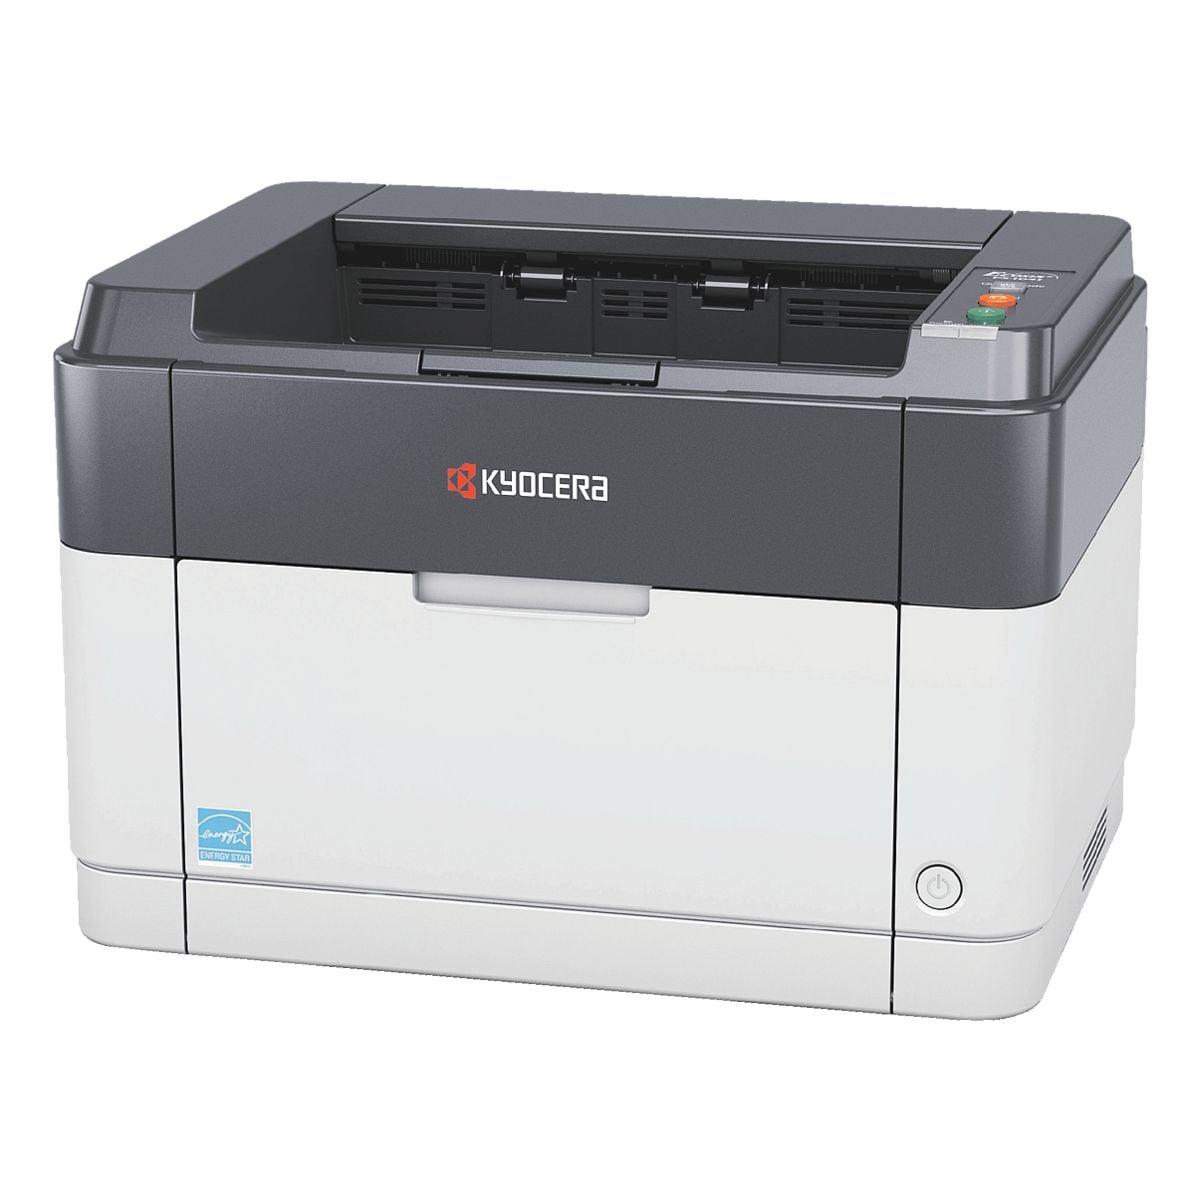 Kyocera FS-1041 Laserdrucker, A4 schwarz weiß Laserdrucker, 1800 x 600 dpi